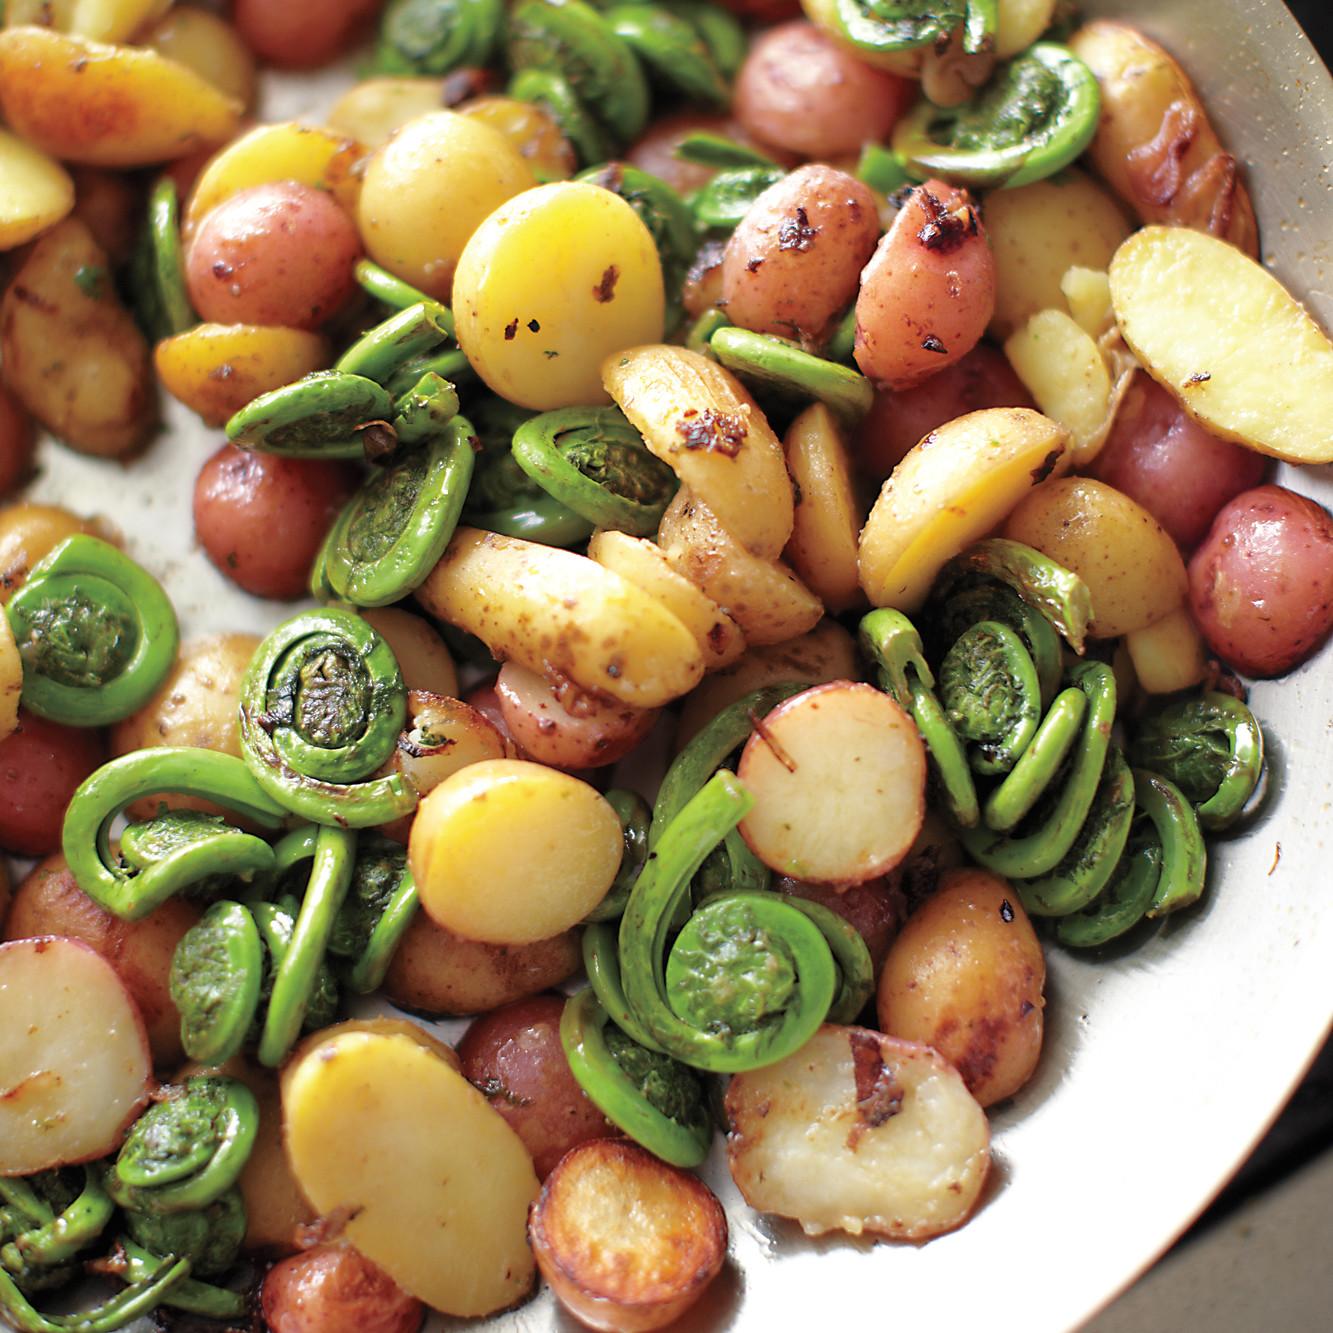 Easy Dinner Menu Ideas